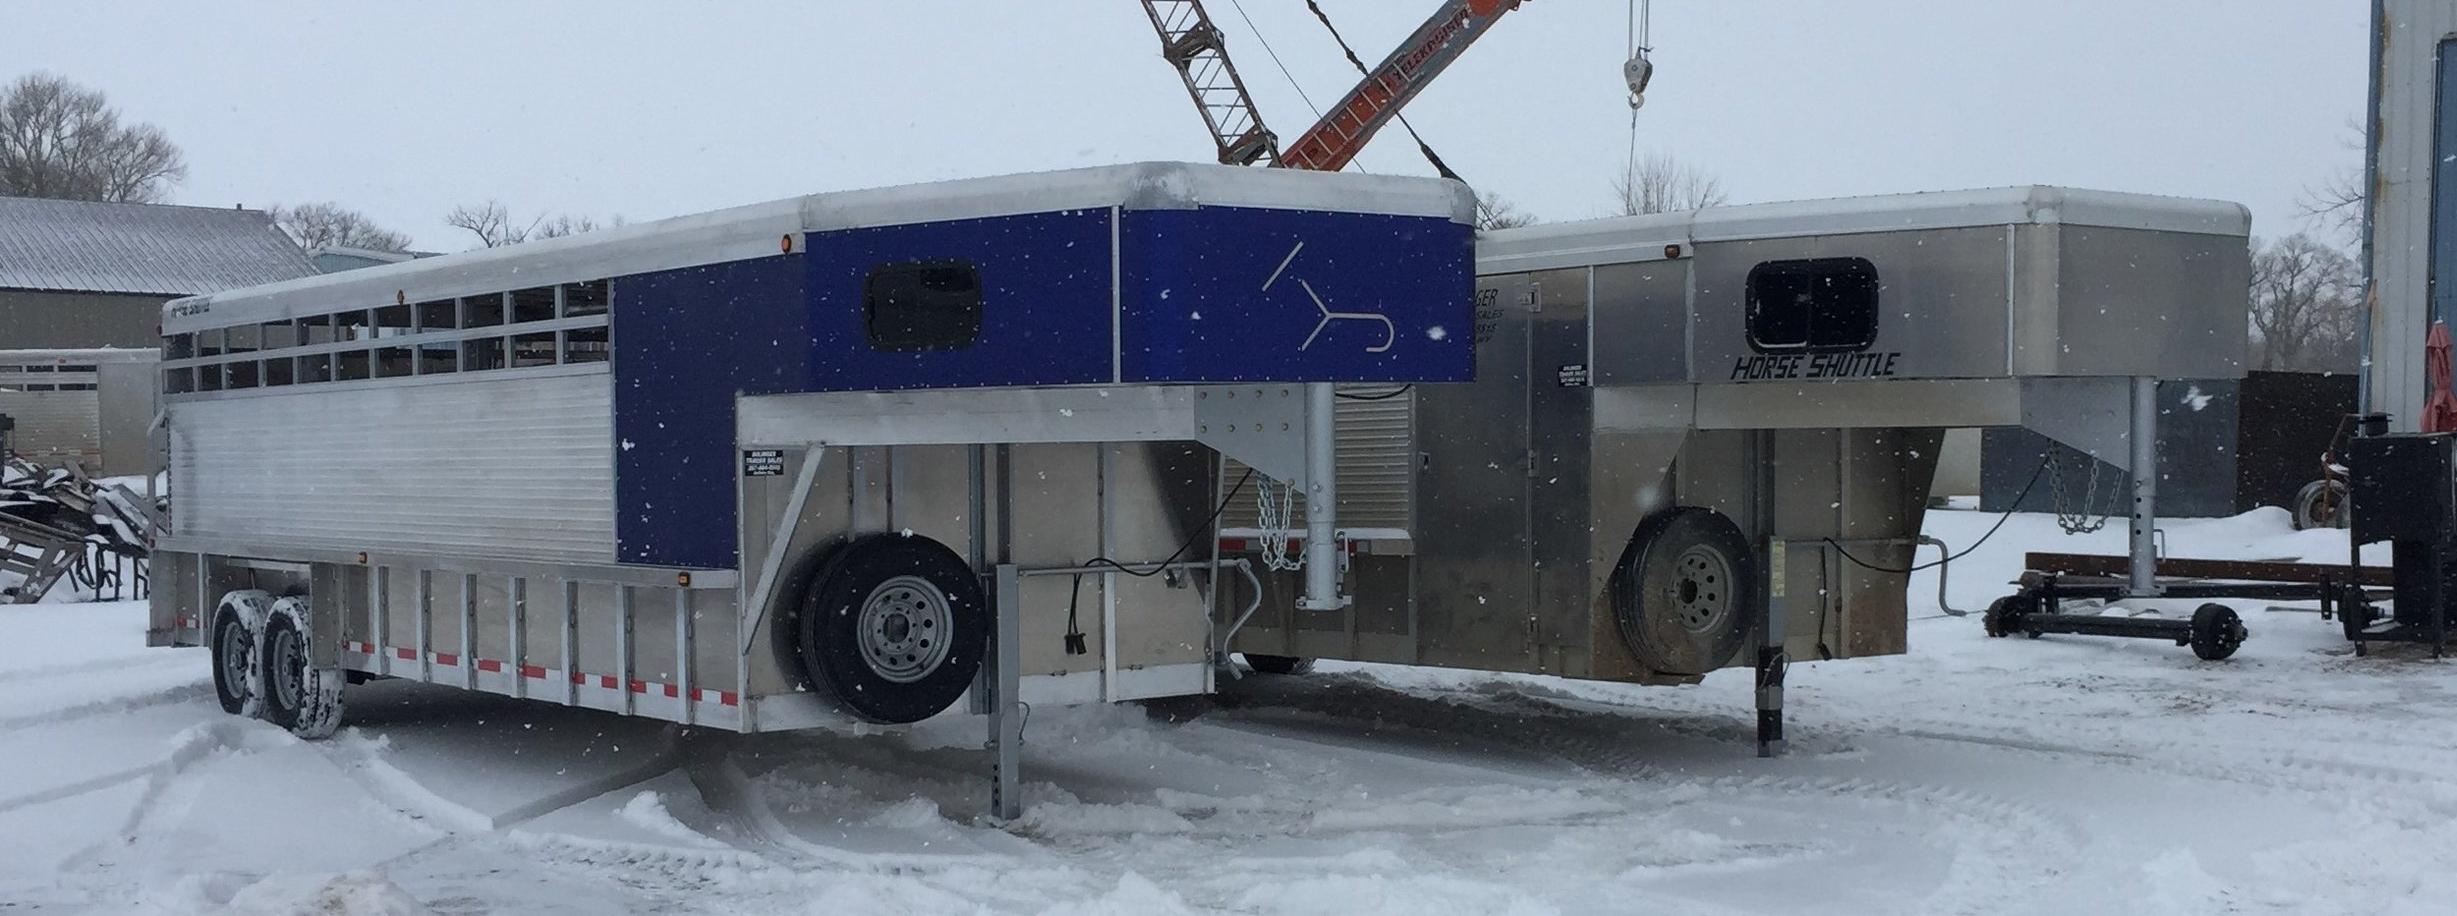 horse.shuttle.trailer.custom.bolinger.inc.blue.tack.room.buffalo.wy